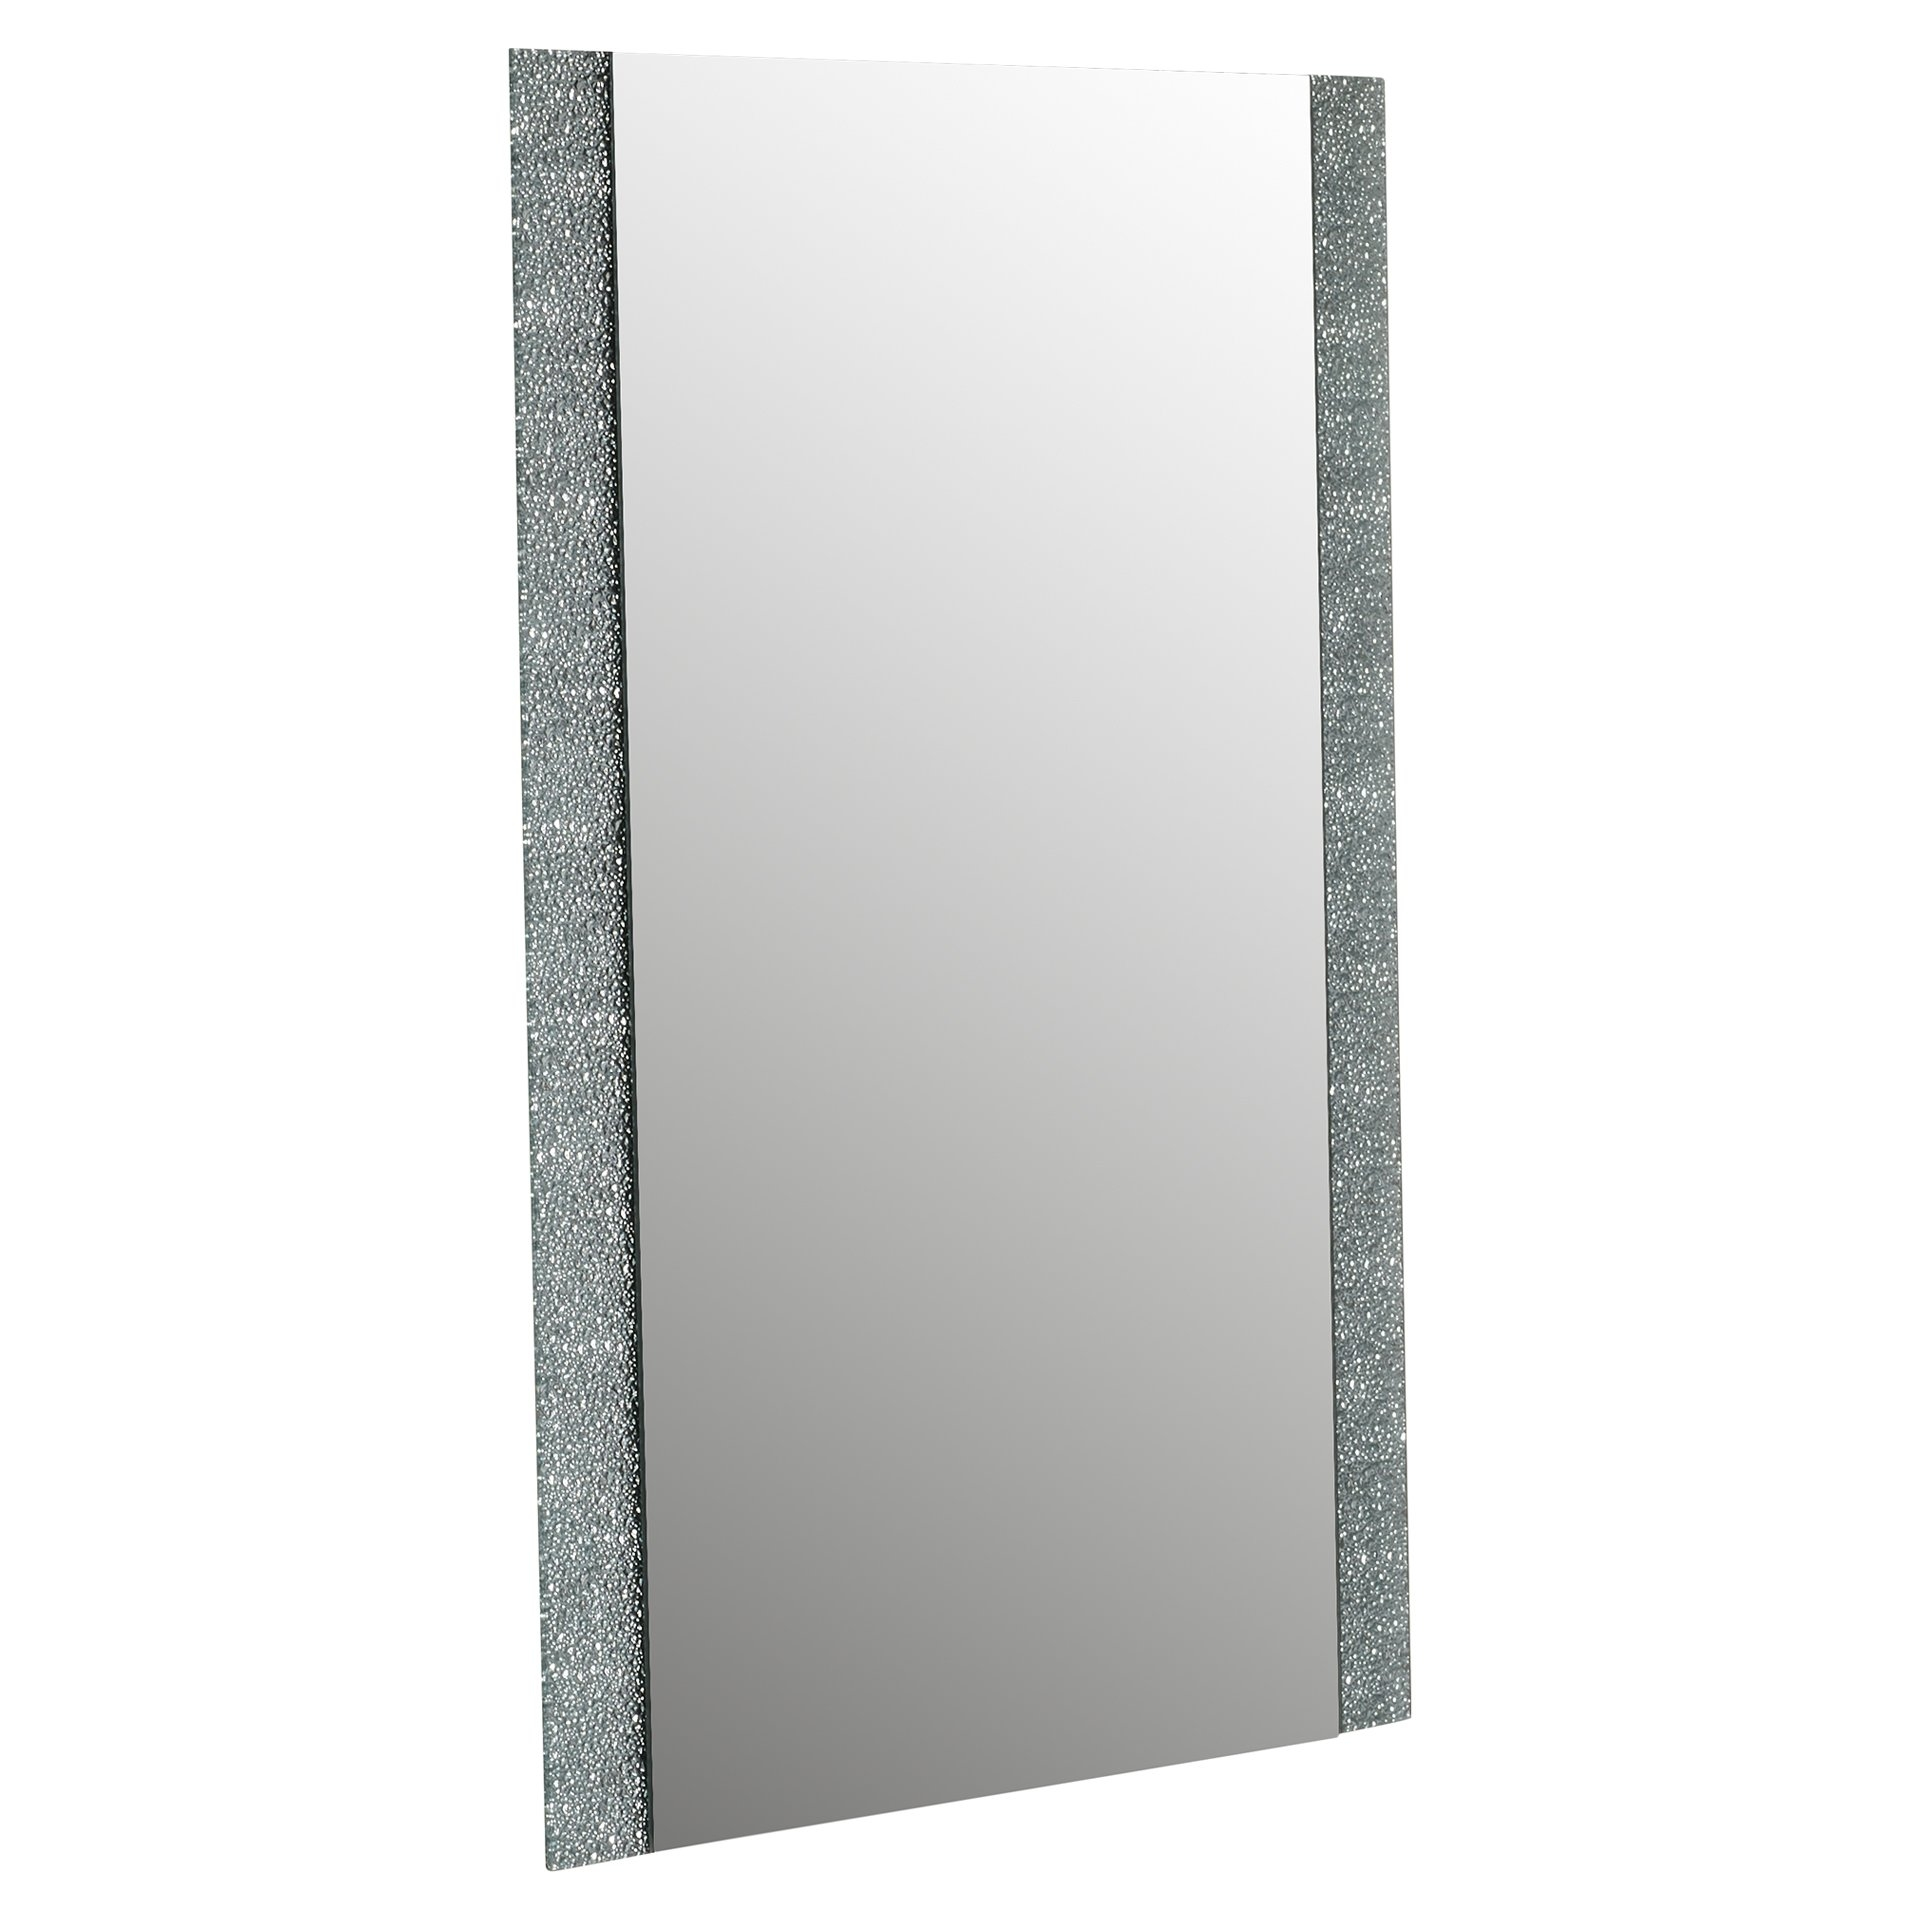 Wade Logan Longwell Green Frameless Wall Mirror Reviews Wayfair With Regard To Frameless Wall Mirror (Image 15 of 15)